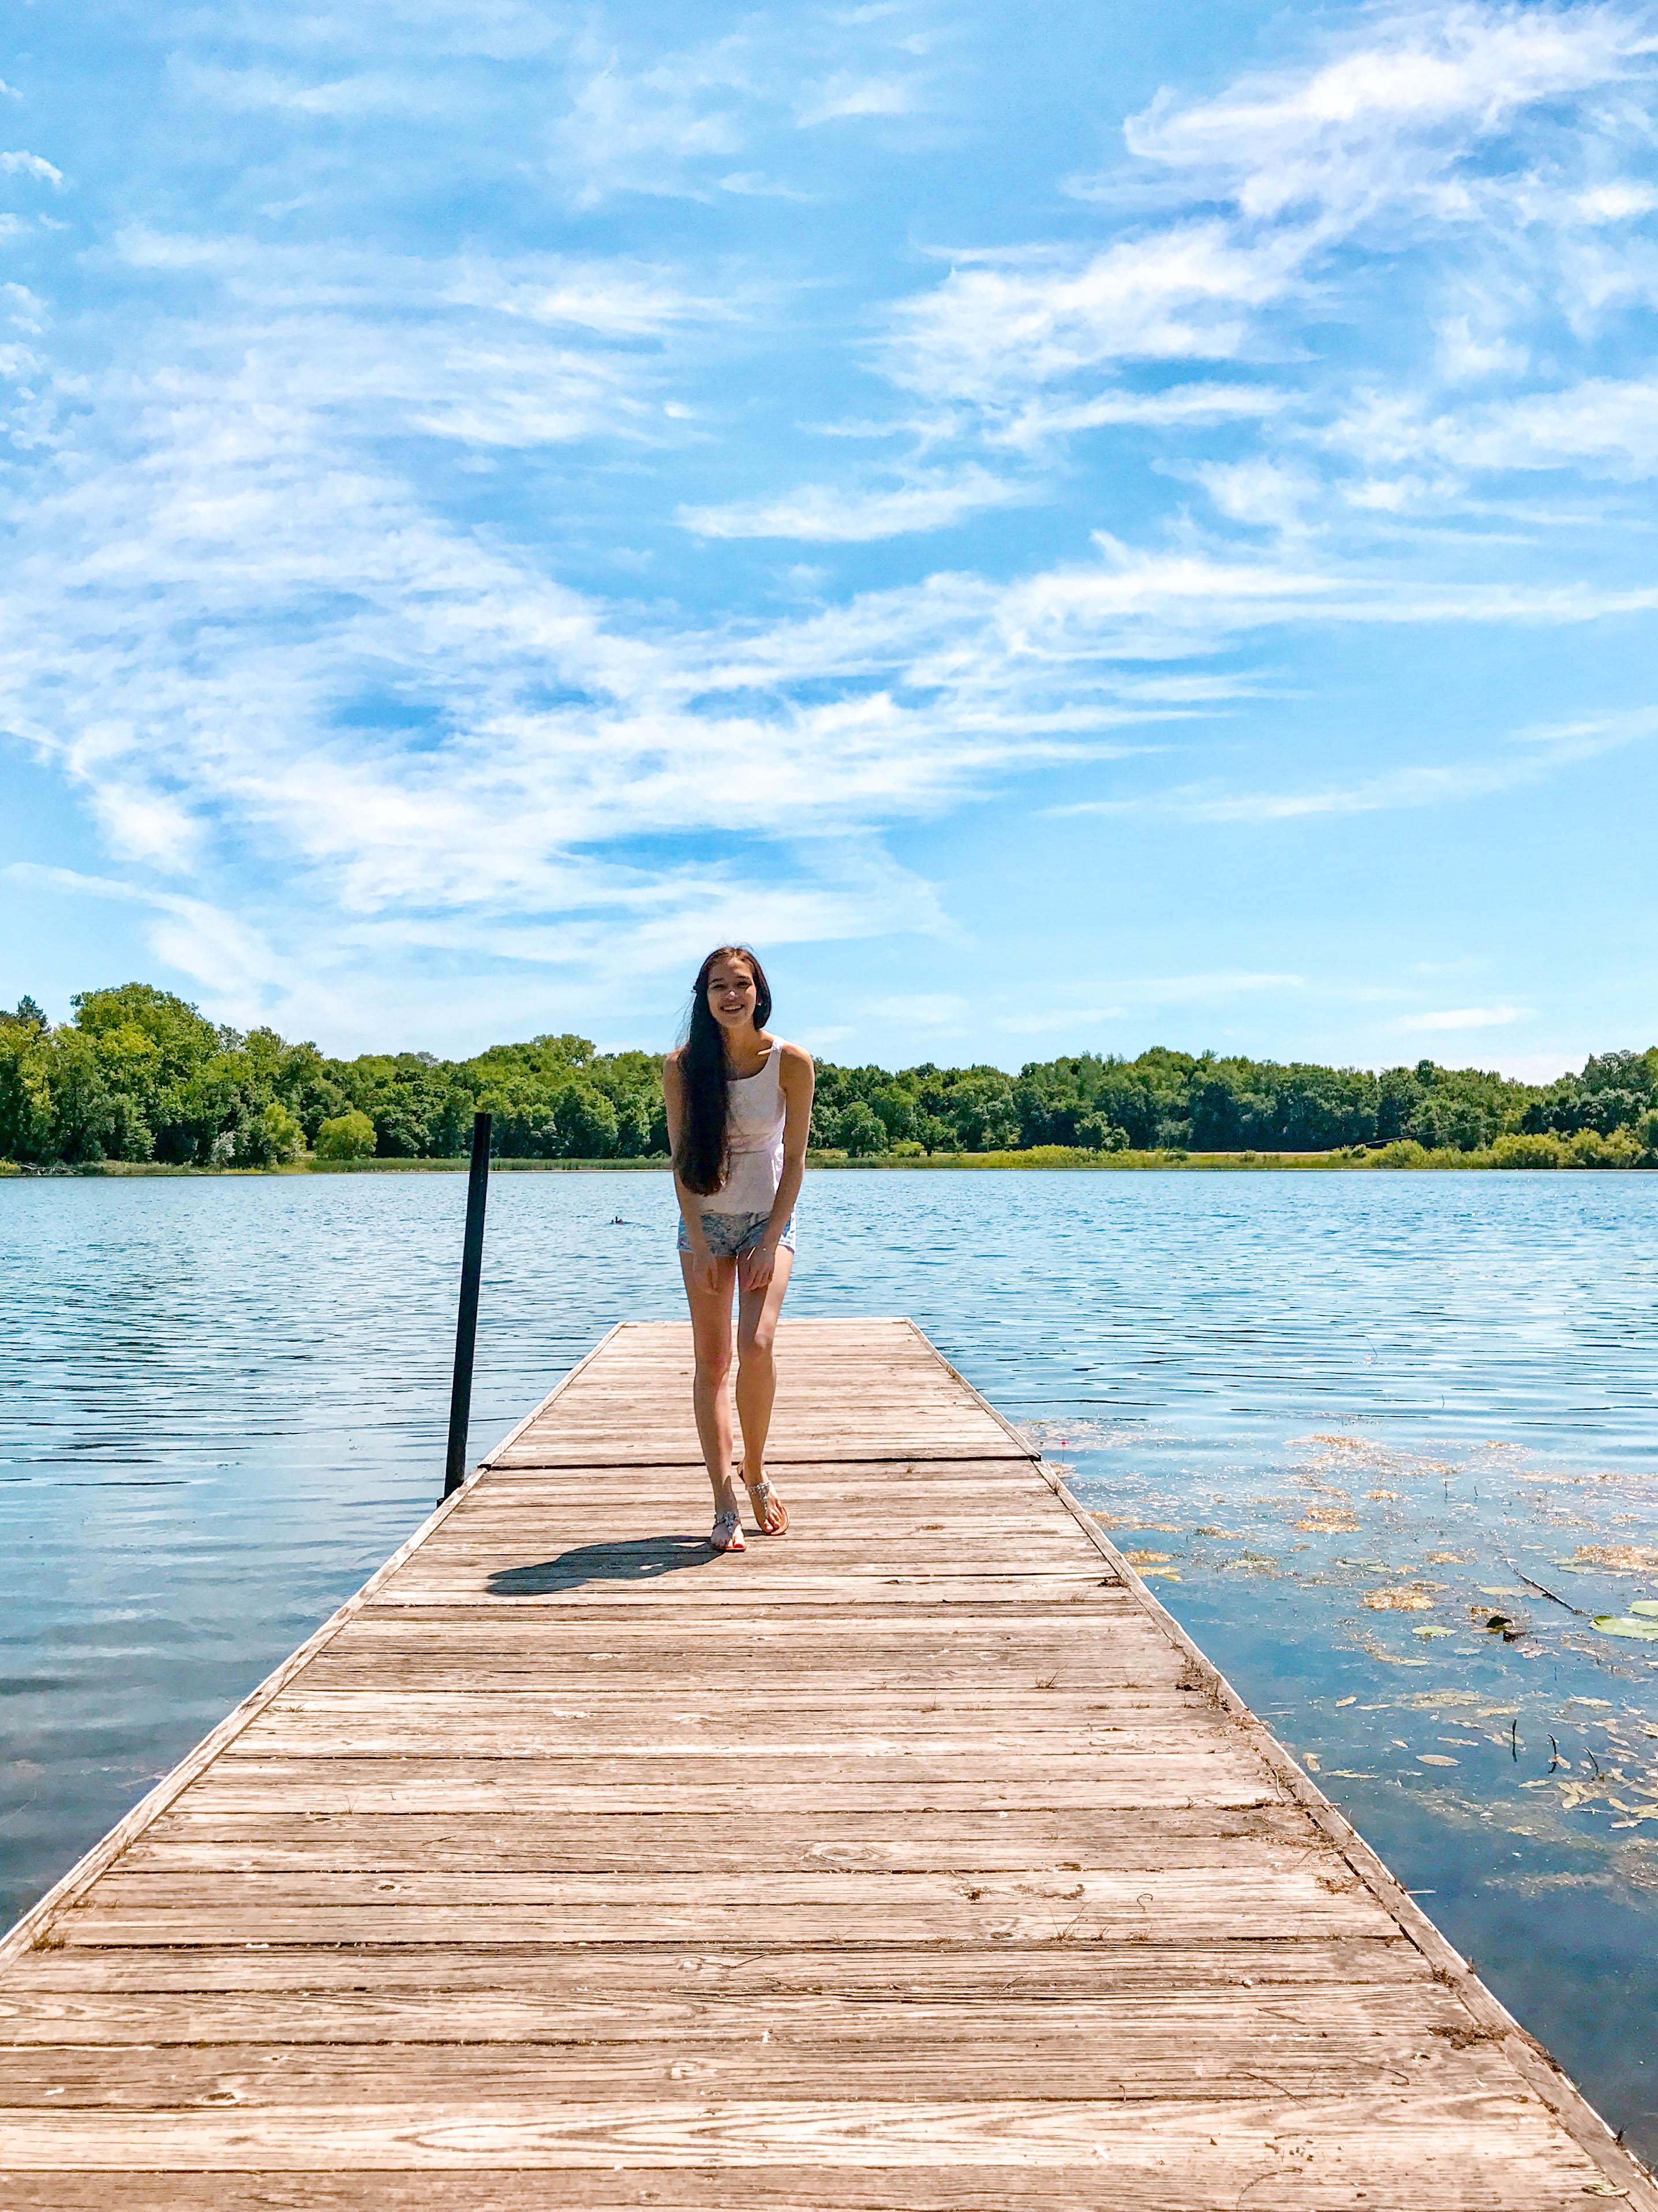 eva phan eva darling travel blogger bush lake bloomington minnesota travel guide where to go in the twin cities lilly pulitzer get nauti liza short